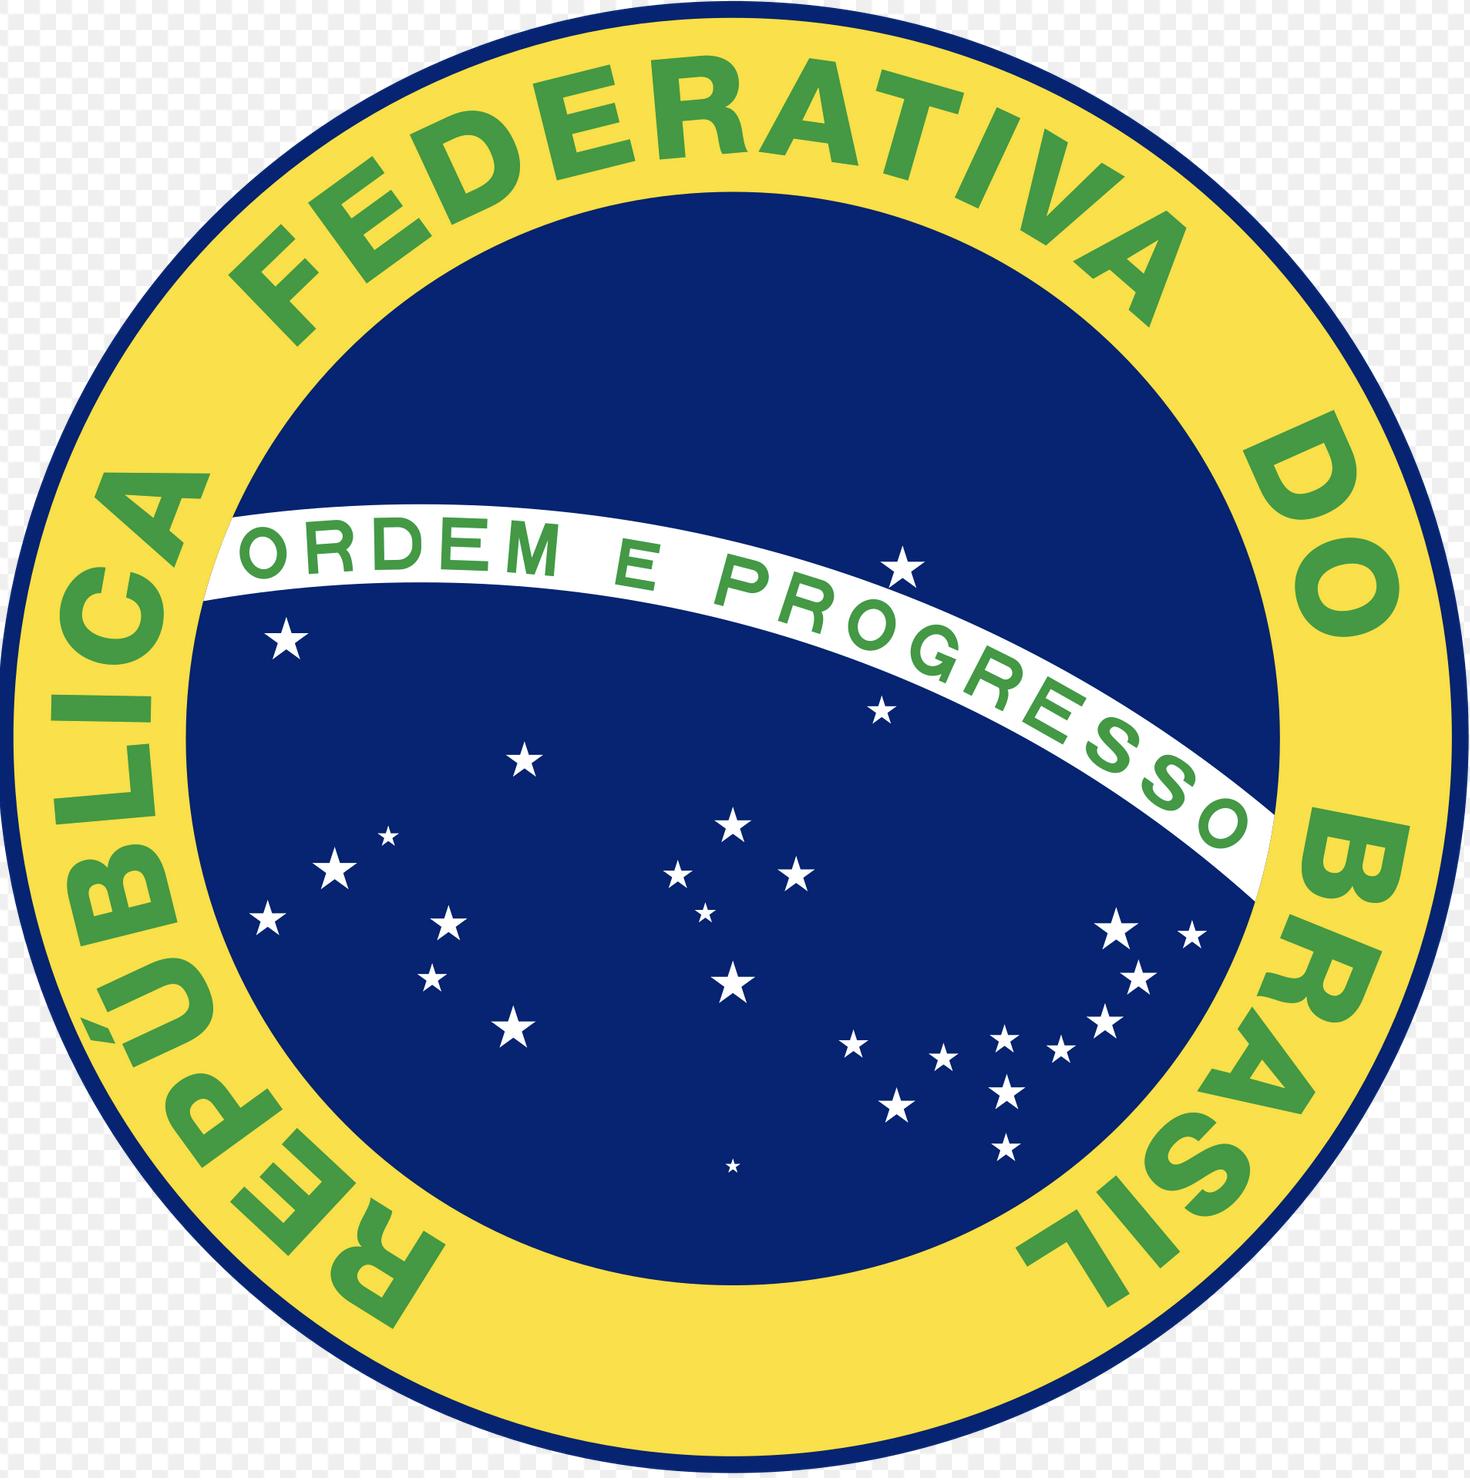 Brazil - General Data Protection Law (LGPD)